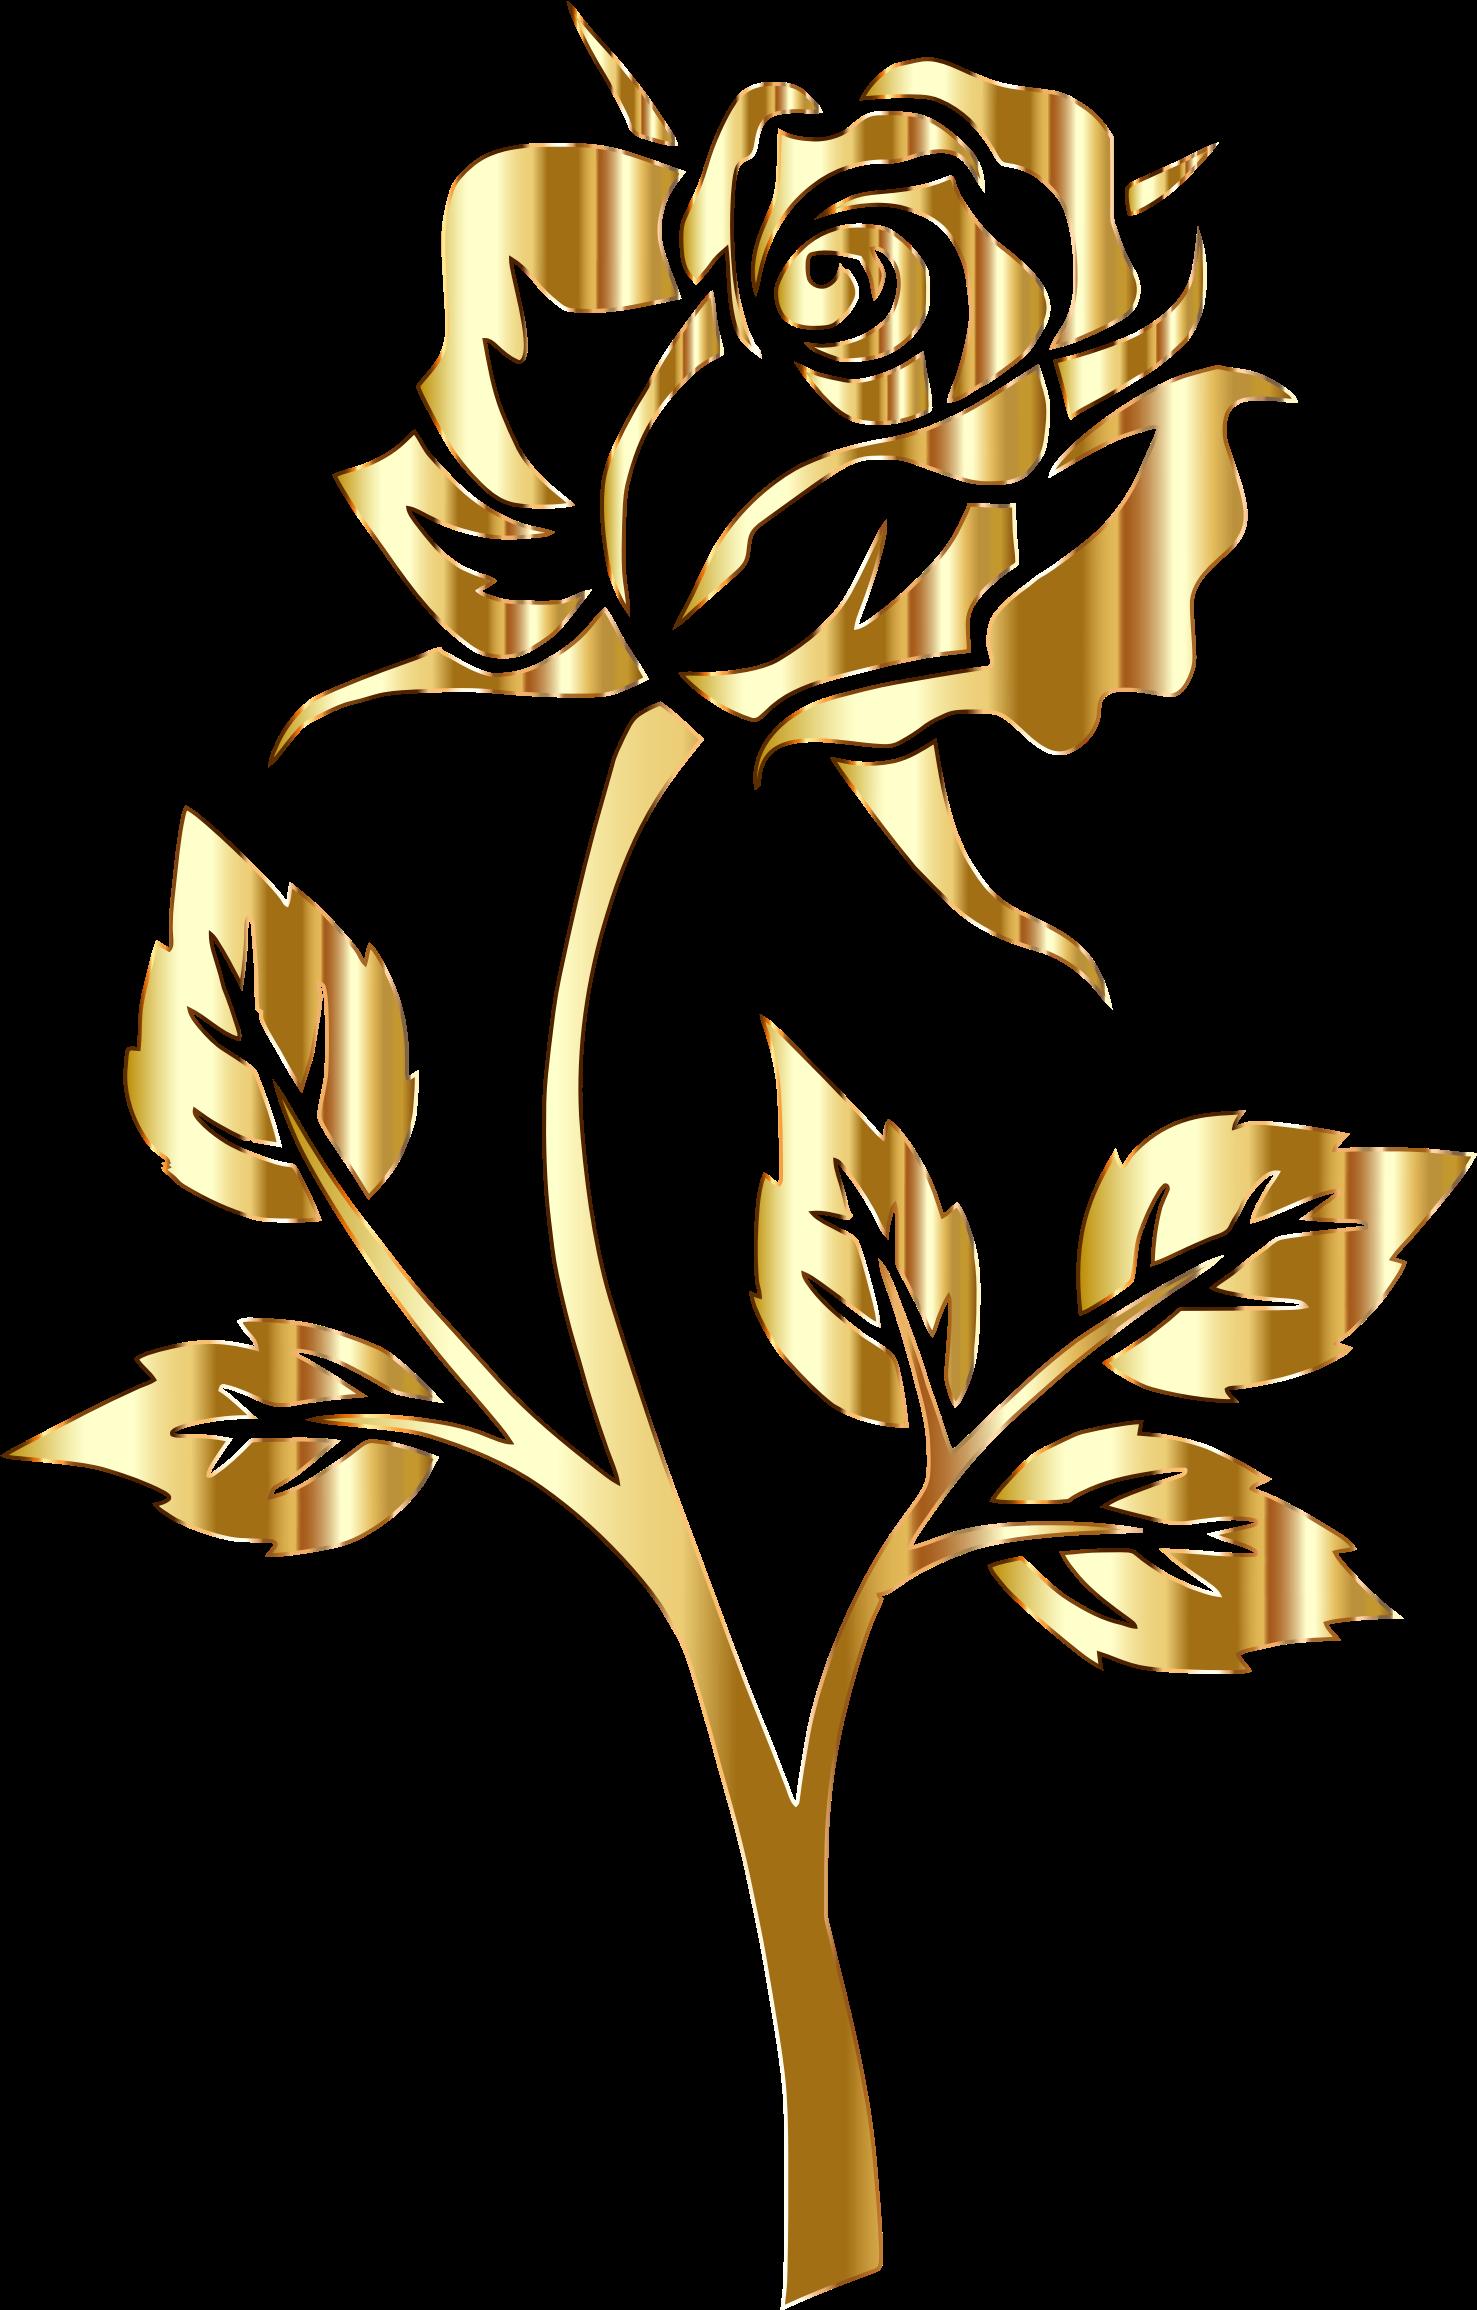 Rose clipart rose gold, Rose rose gold Transparent FREE for.